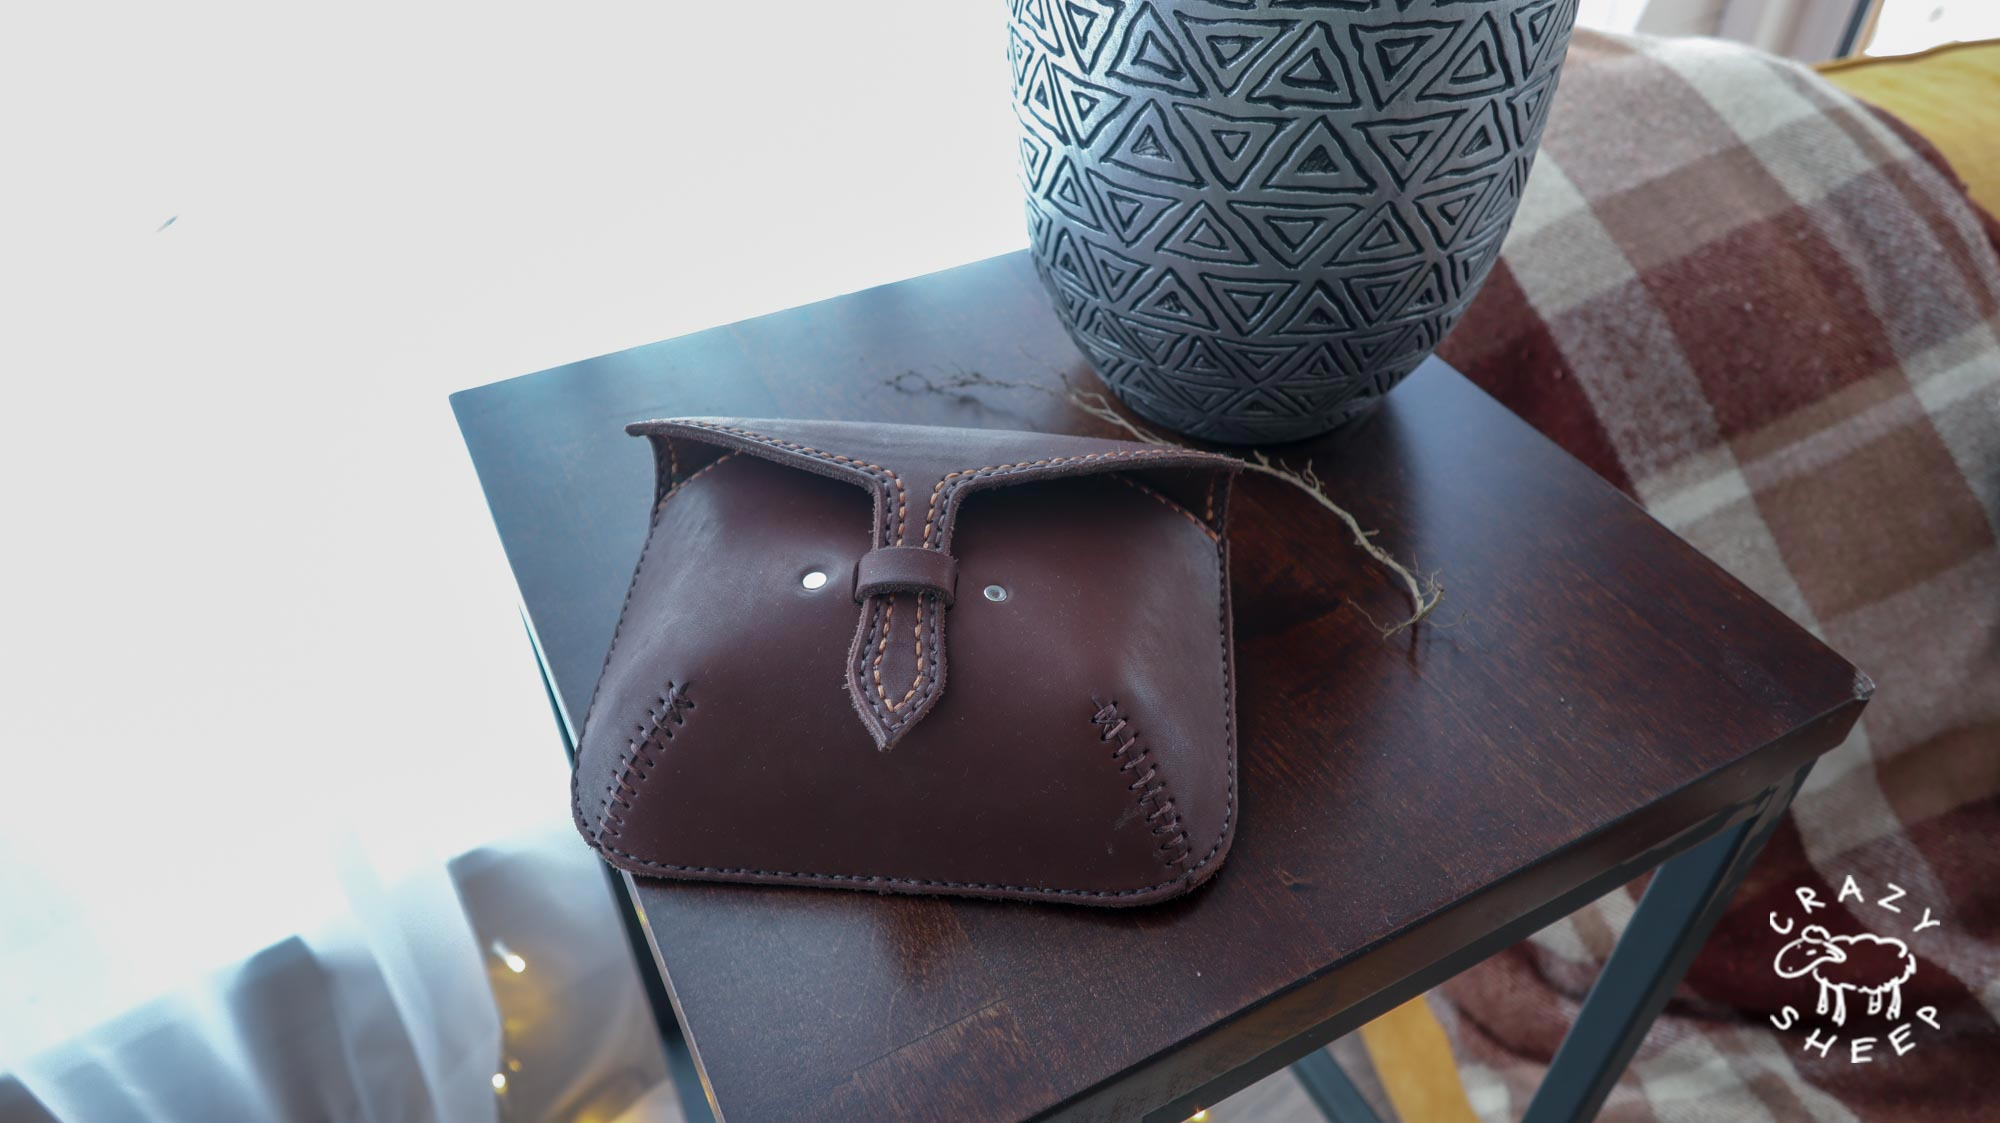 Third pocket bag